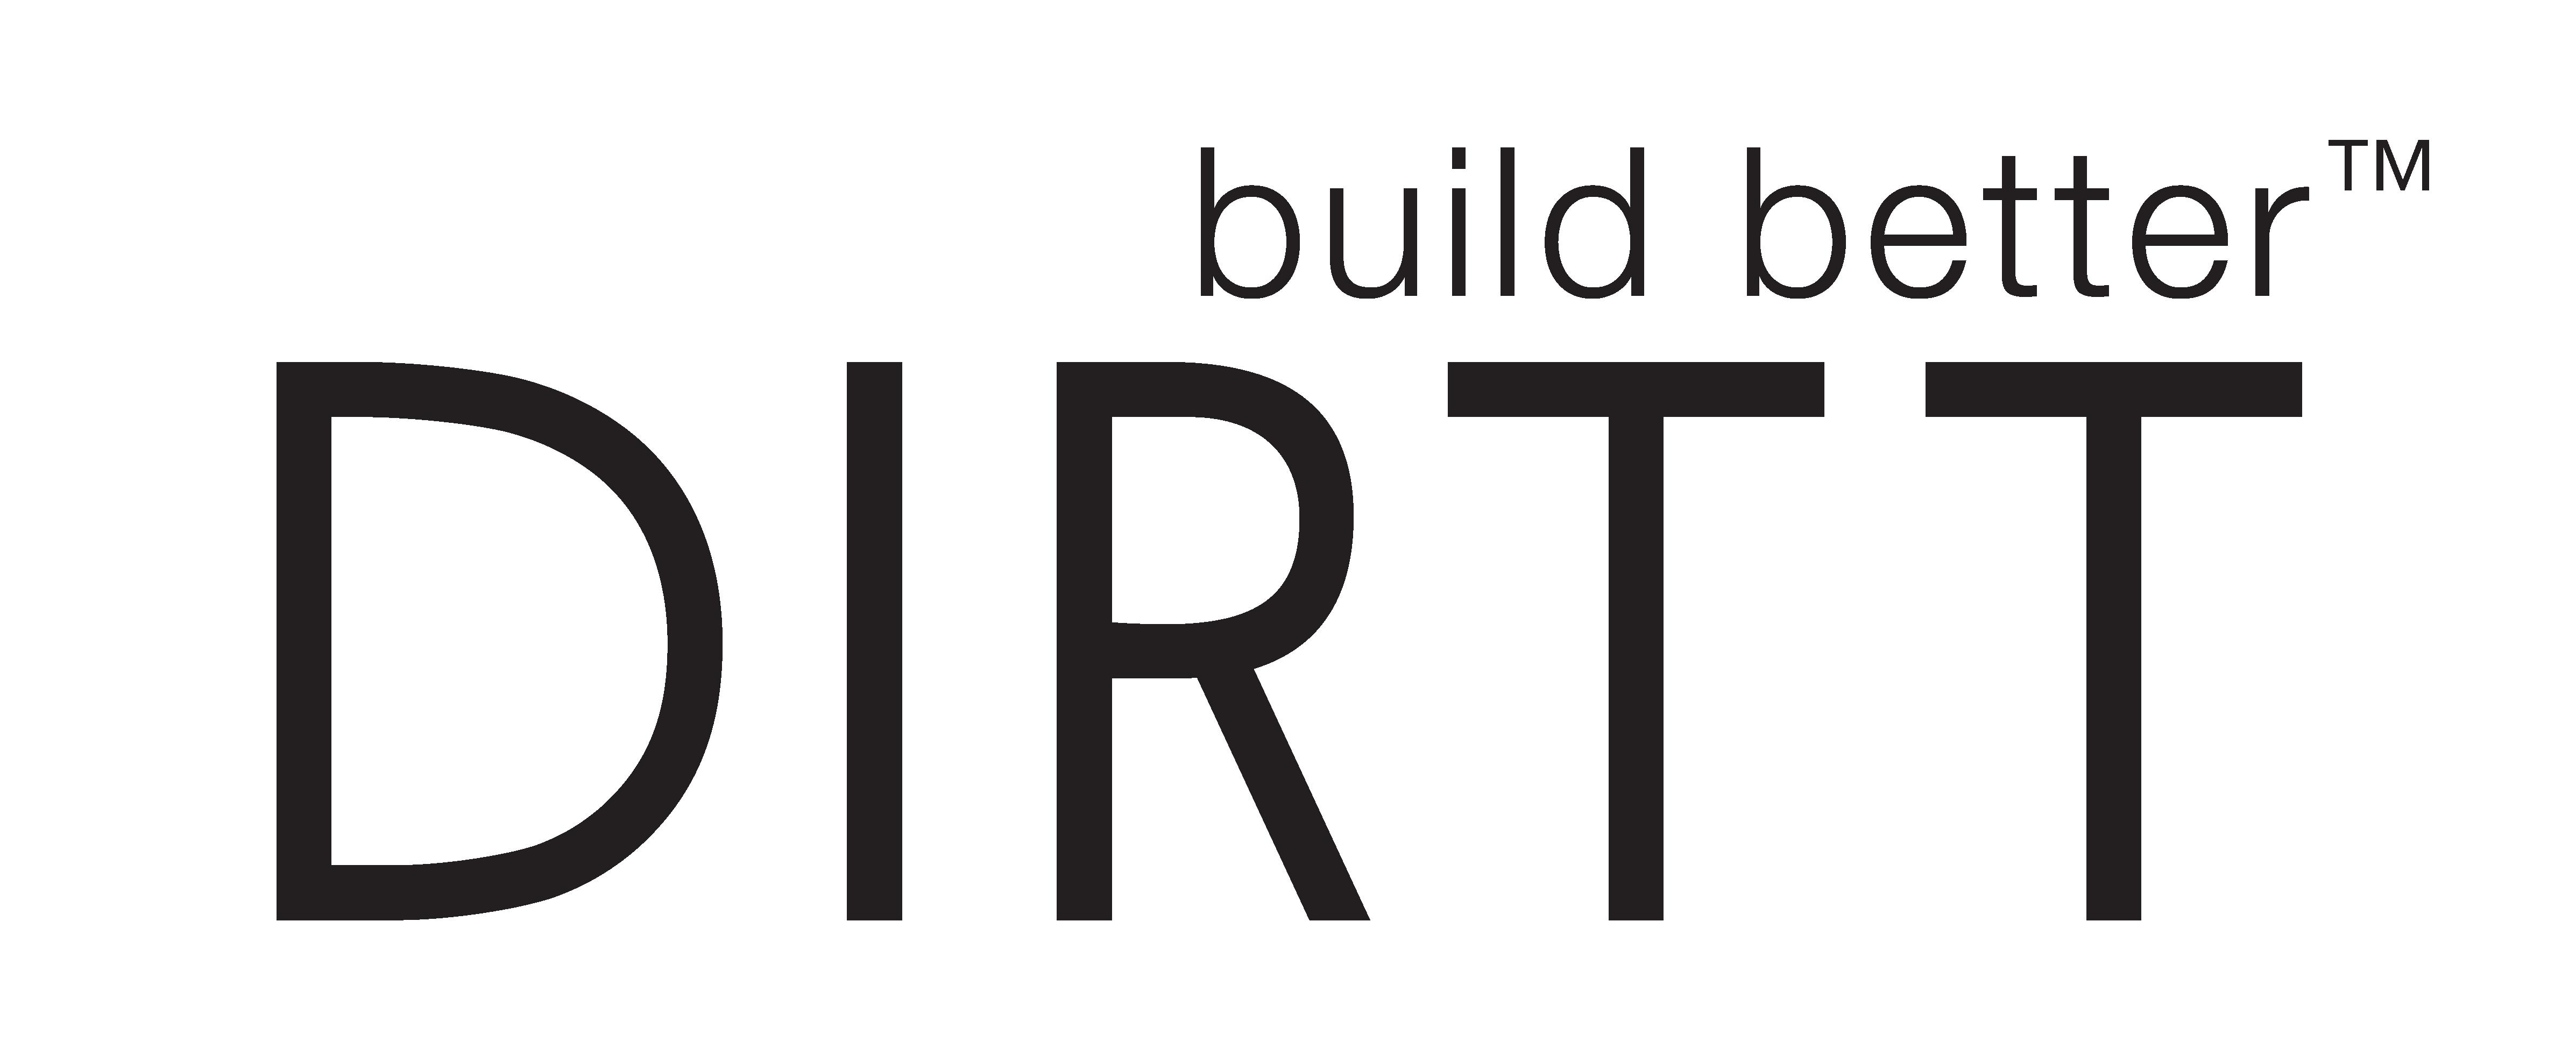 DIRTT Buildbetter TM 1920x695 black